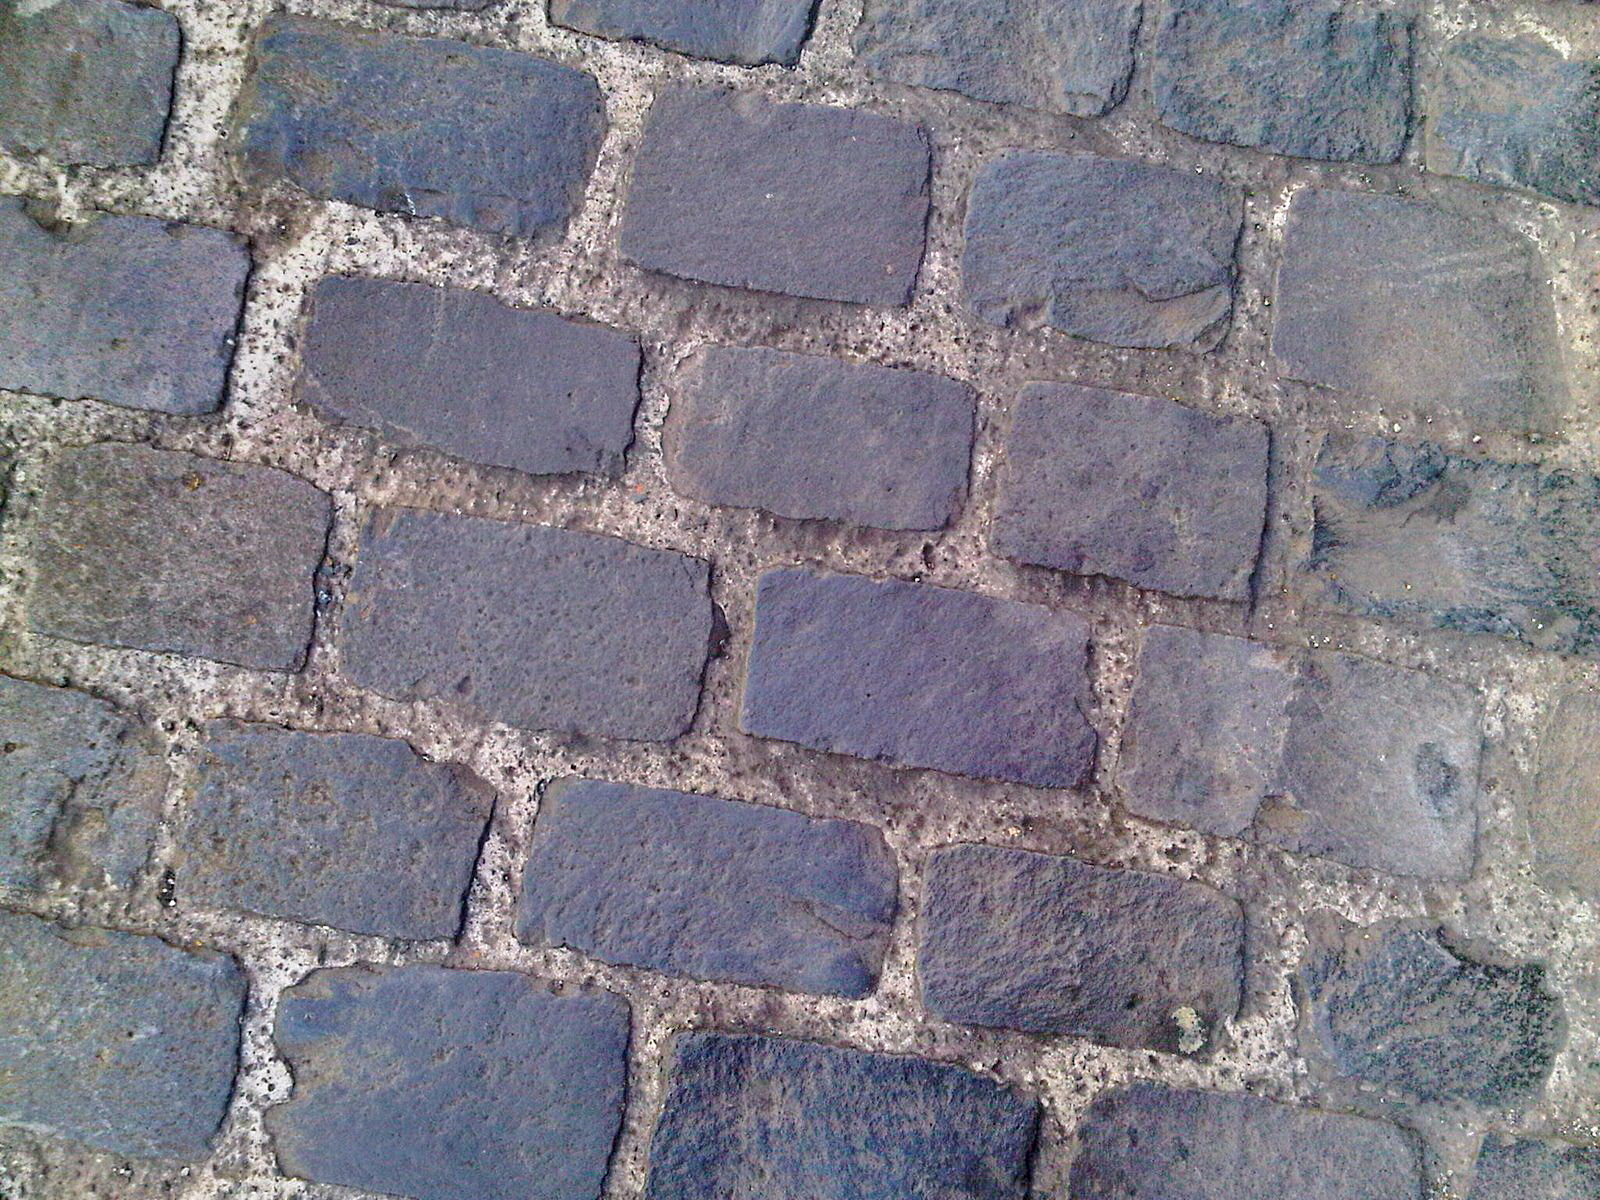 a city street with basalt stones